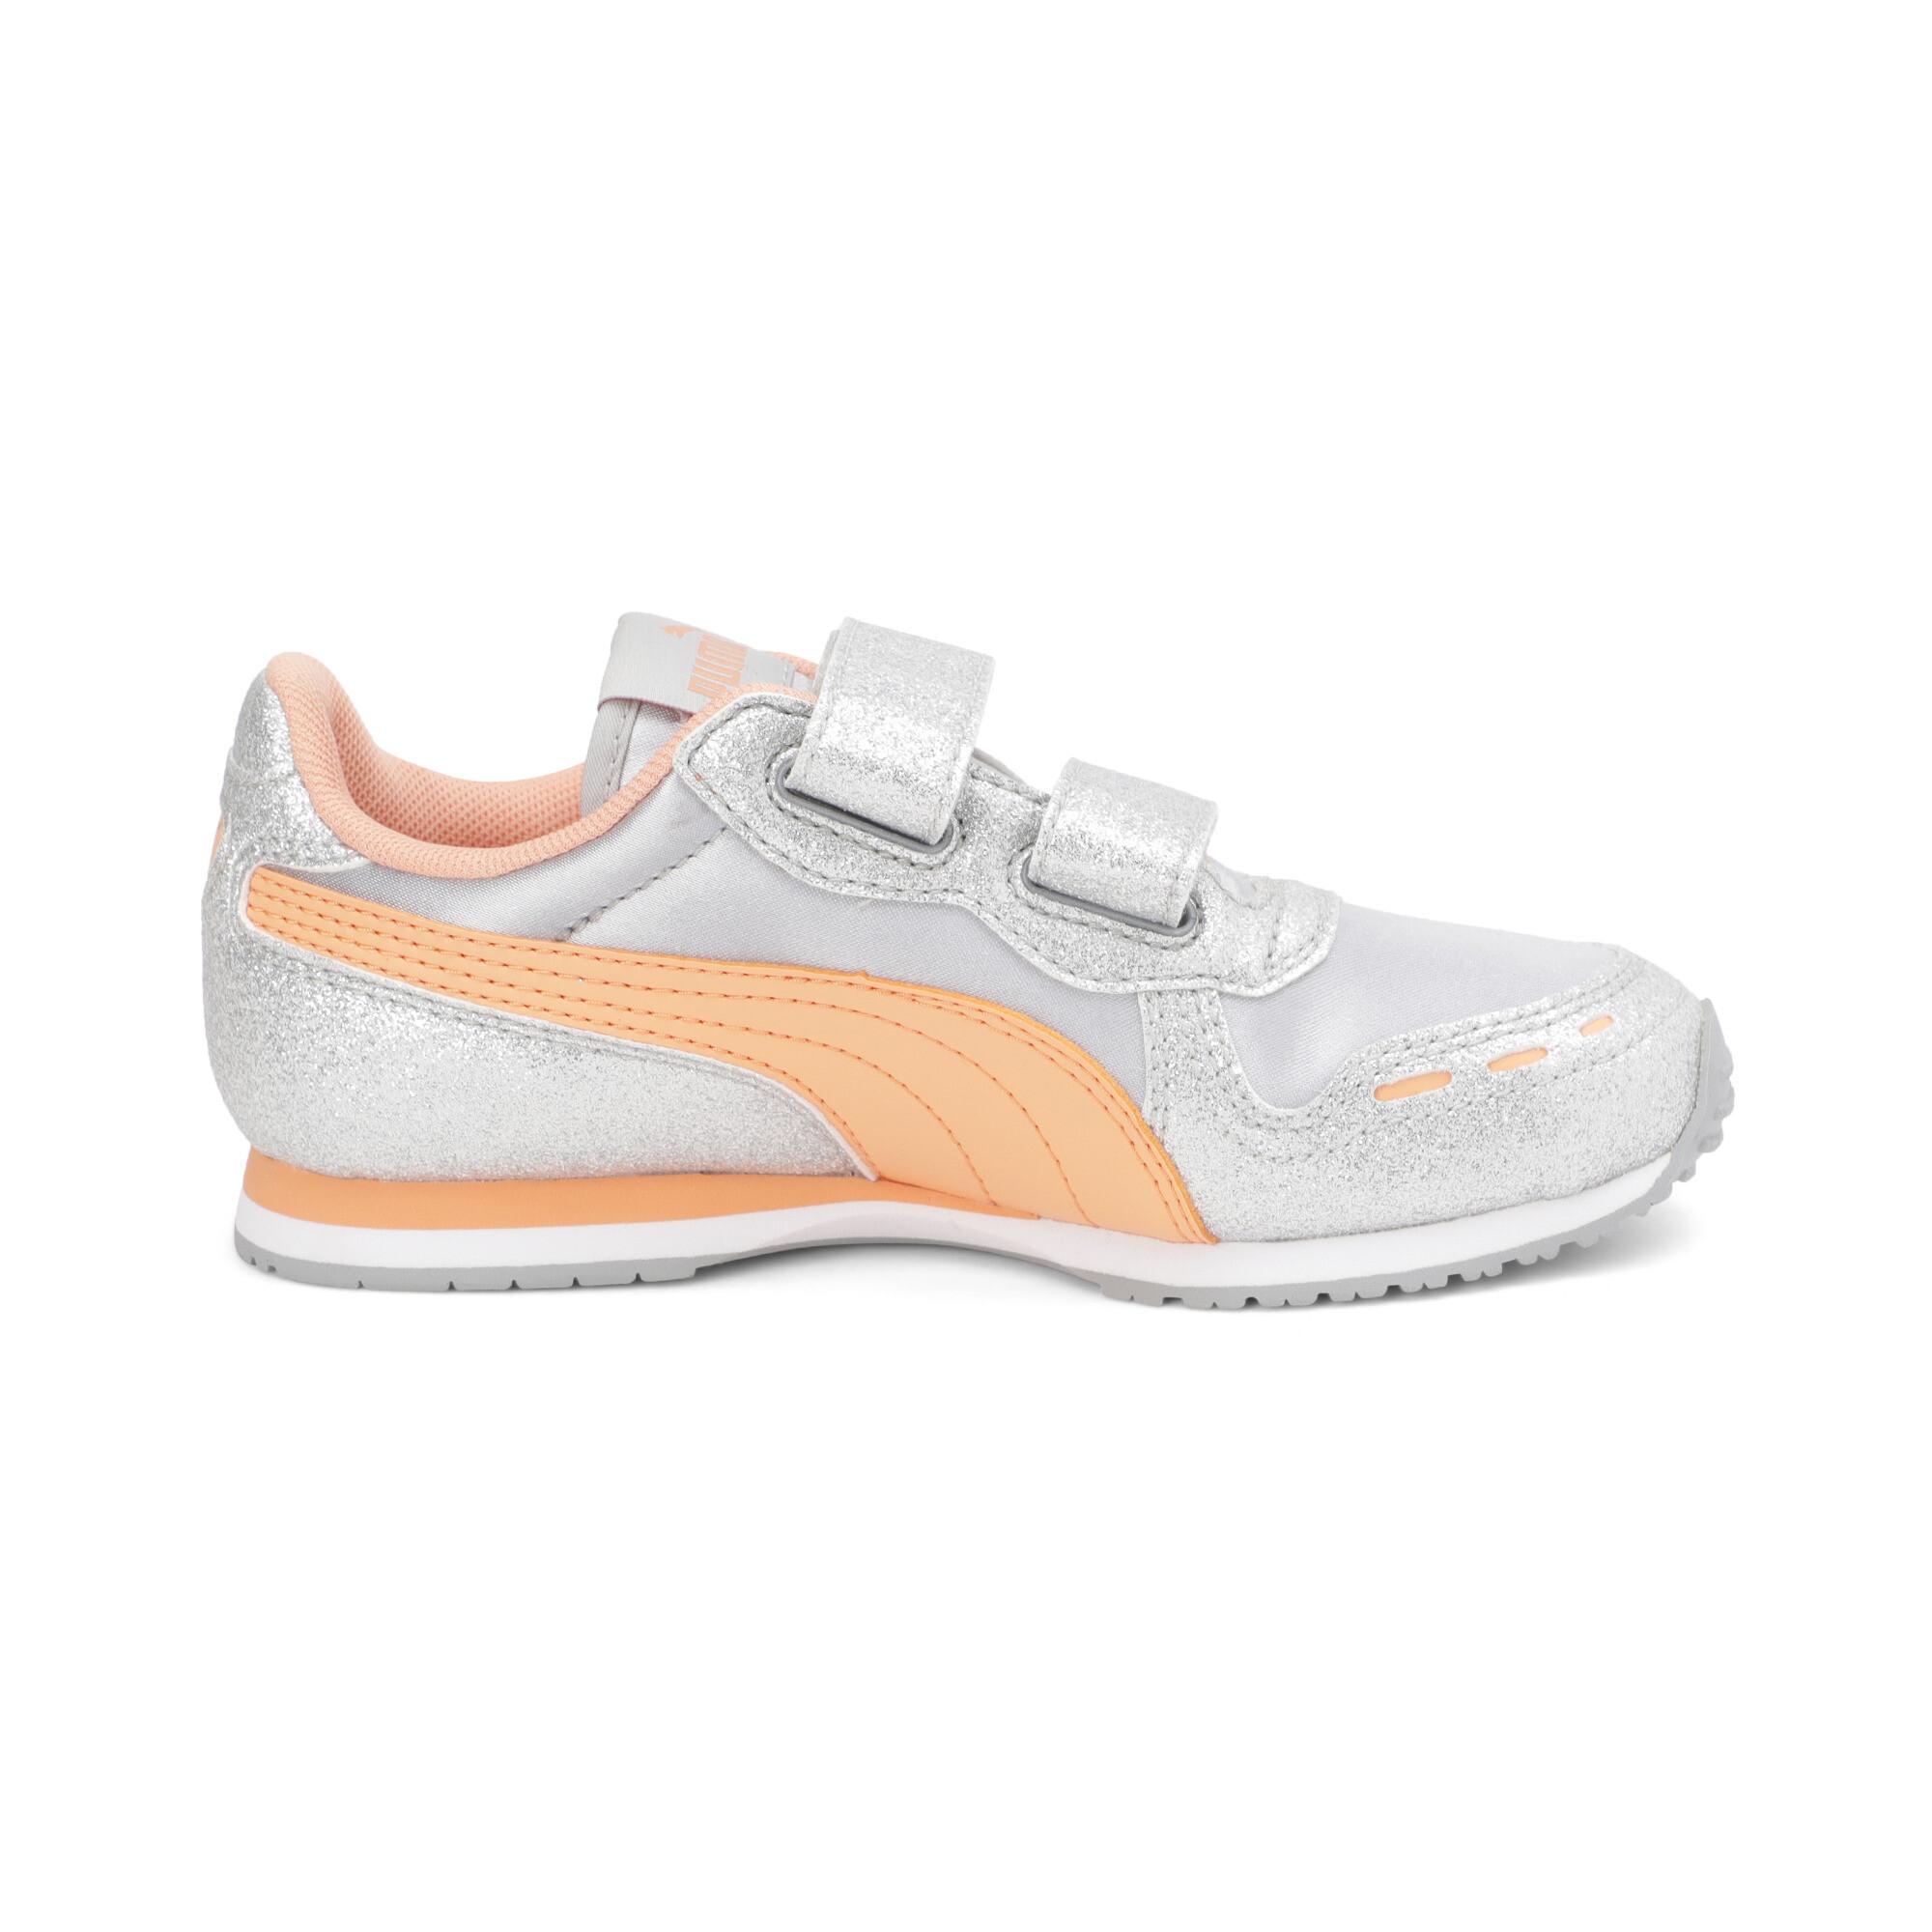 PUMA-Pre-School-Girl-039-s-Cabana-Racer-Glitz-AC-Shoes thumbnail 24